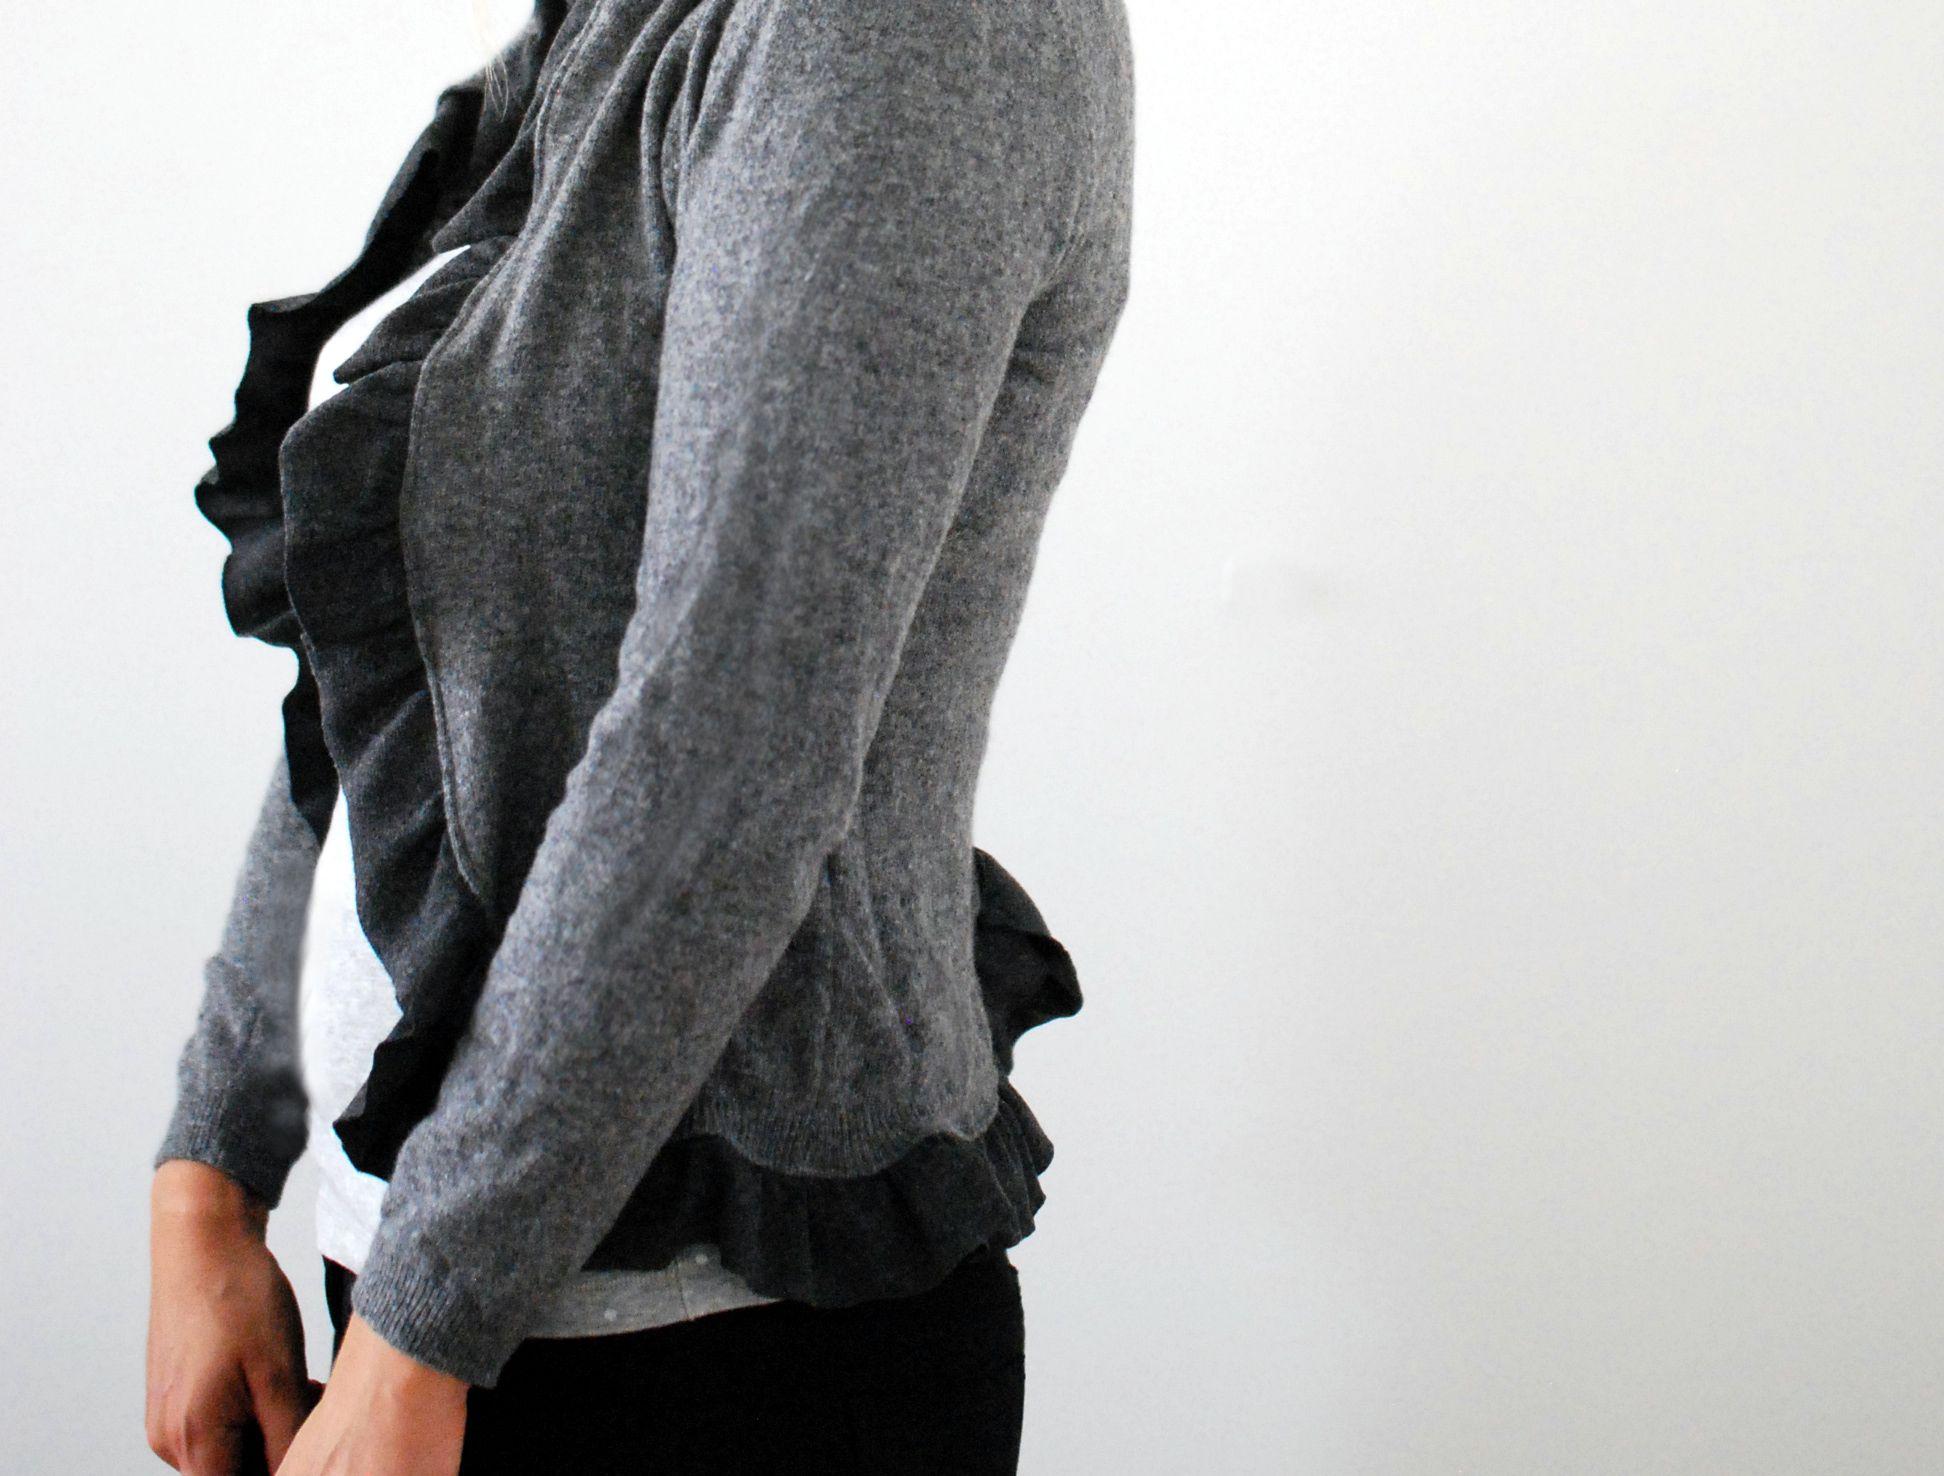 Upcycling Anleitung Vom Pullover Zur Strickjacke Inspiracje I